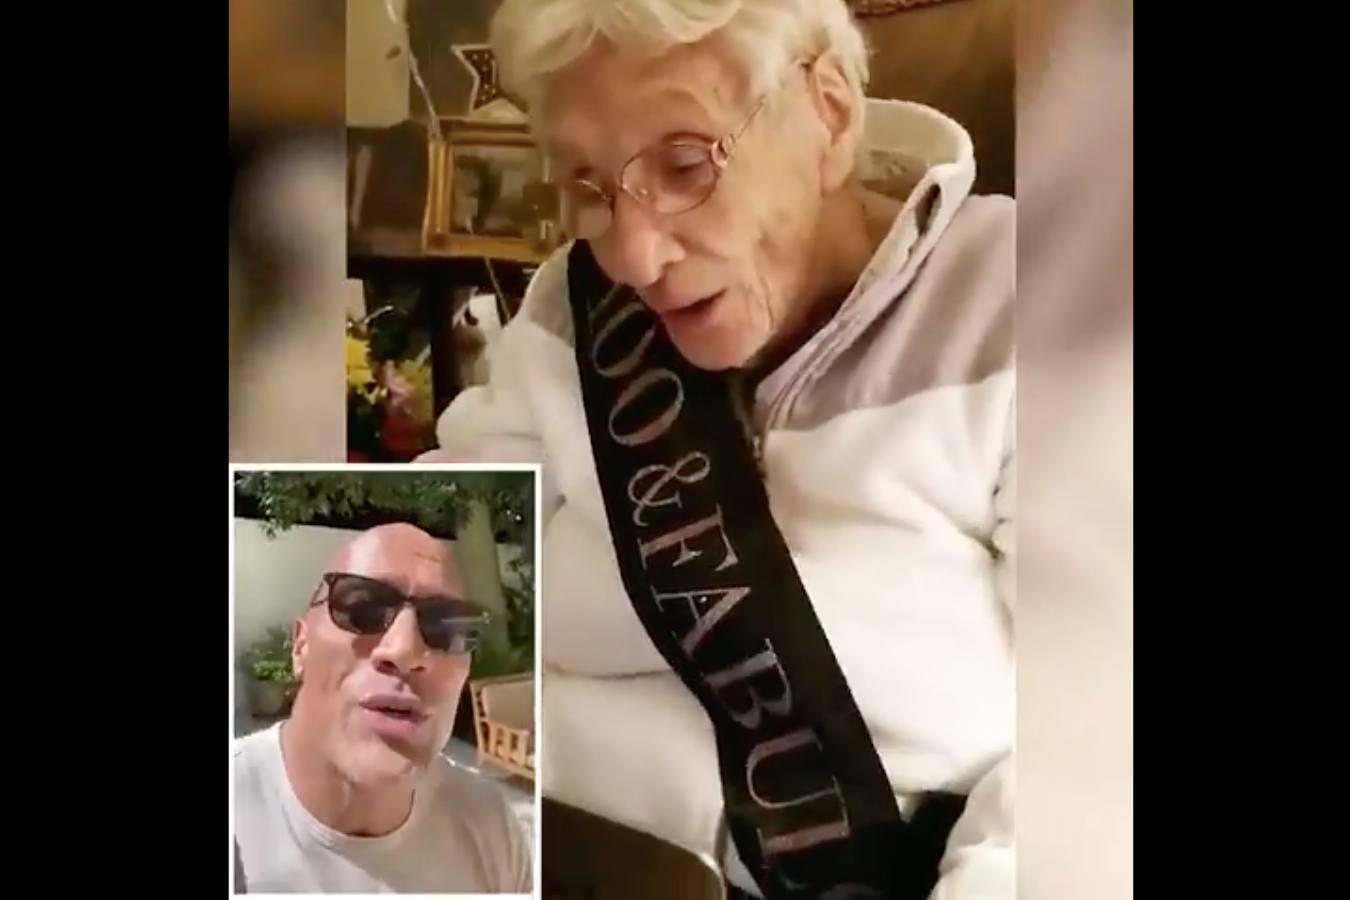 dwayne johnson marie grover the rock birthday video